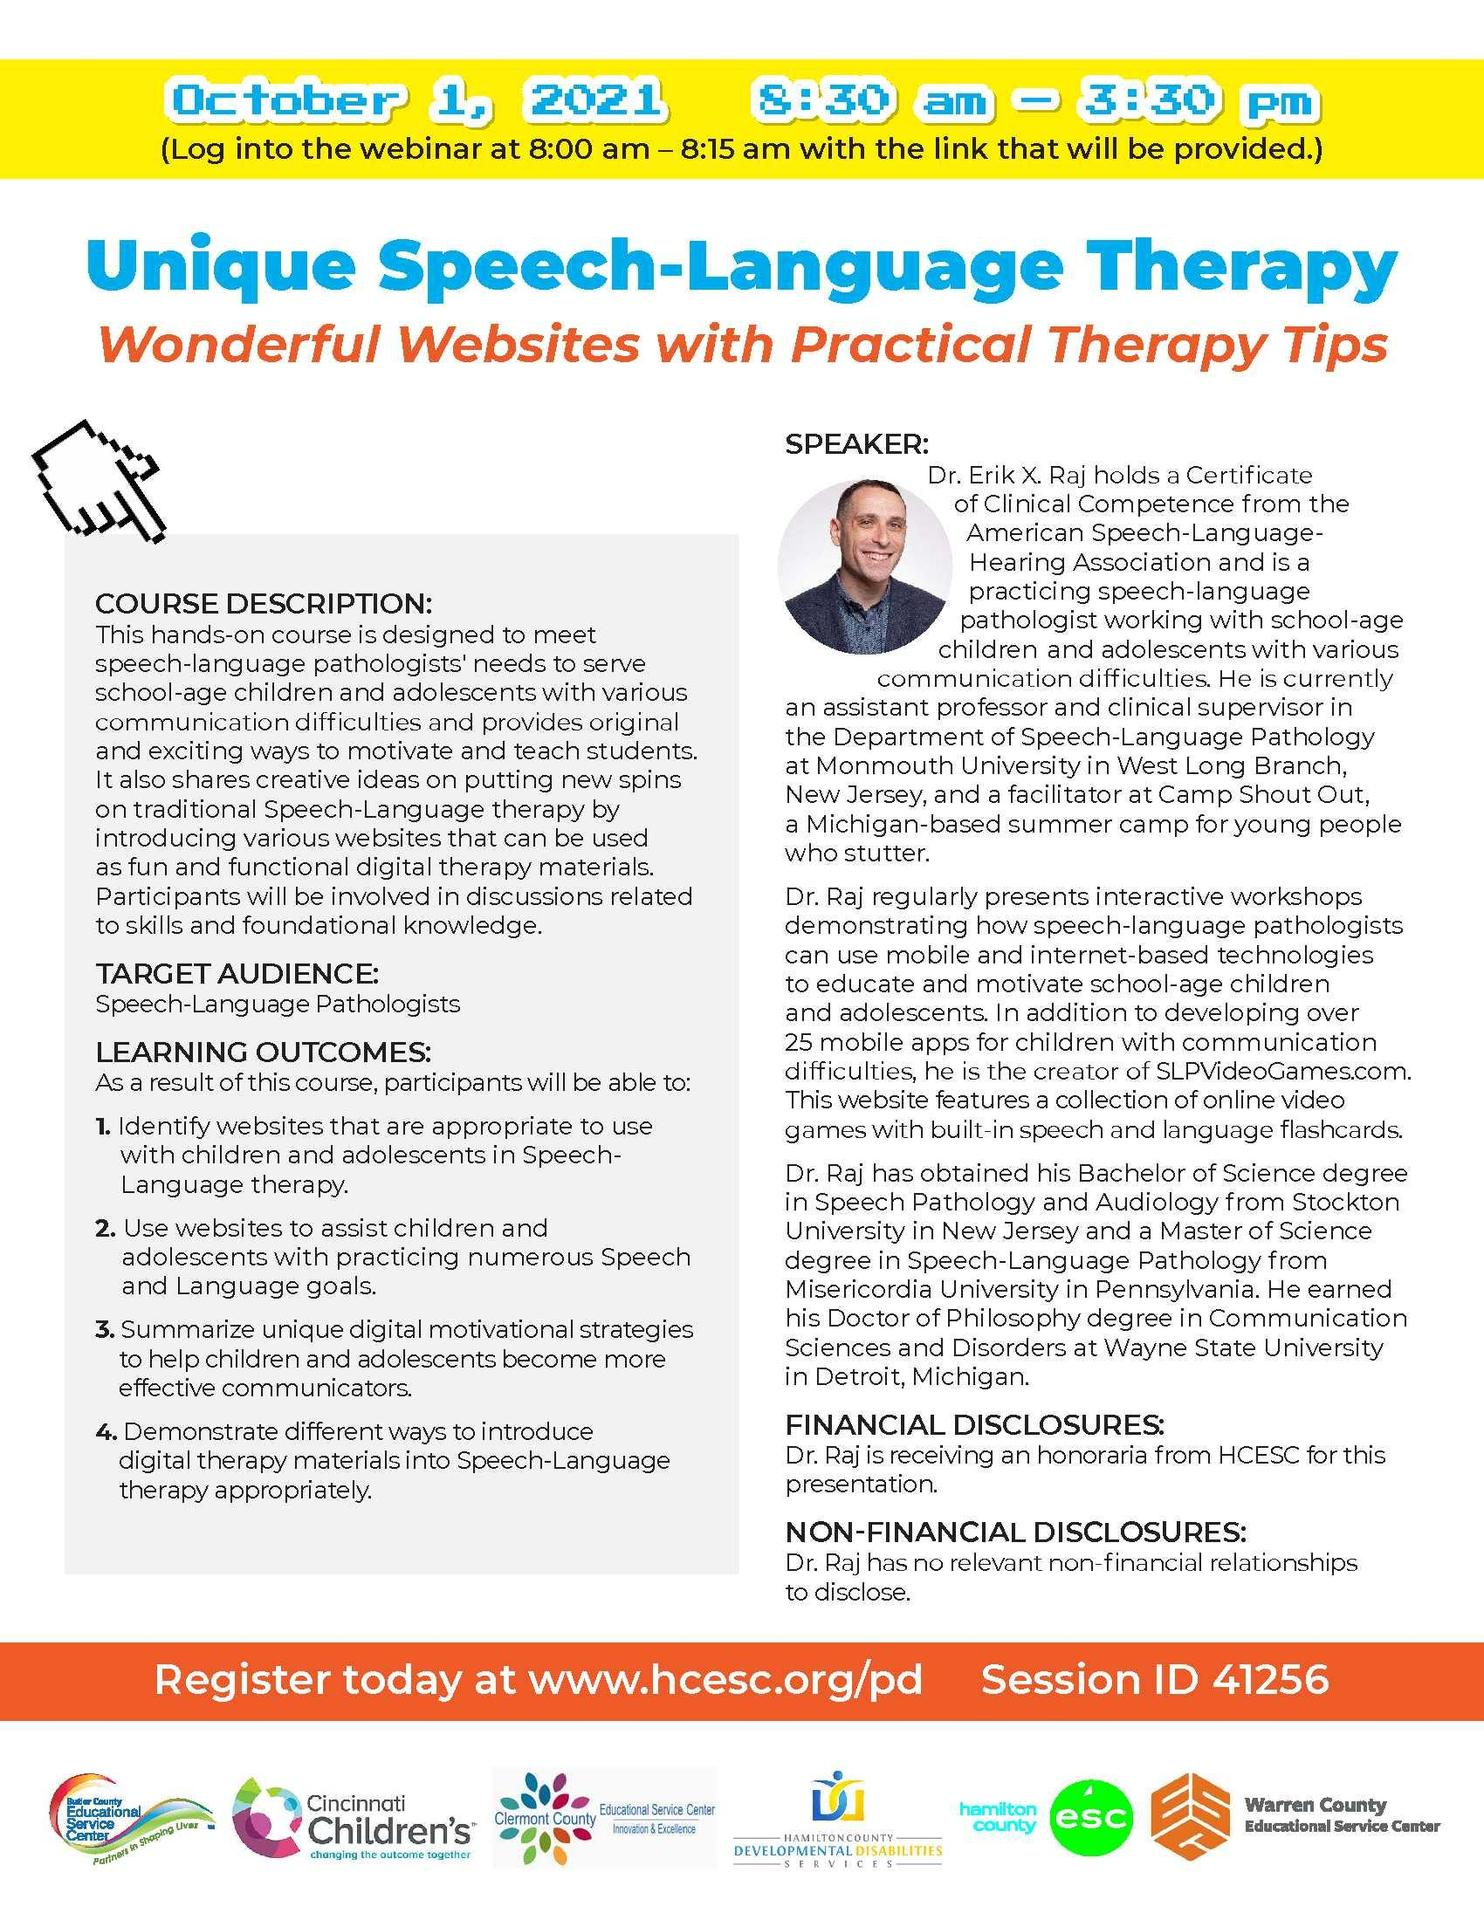 Unique Speech-Language Therapy Flyer